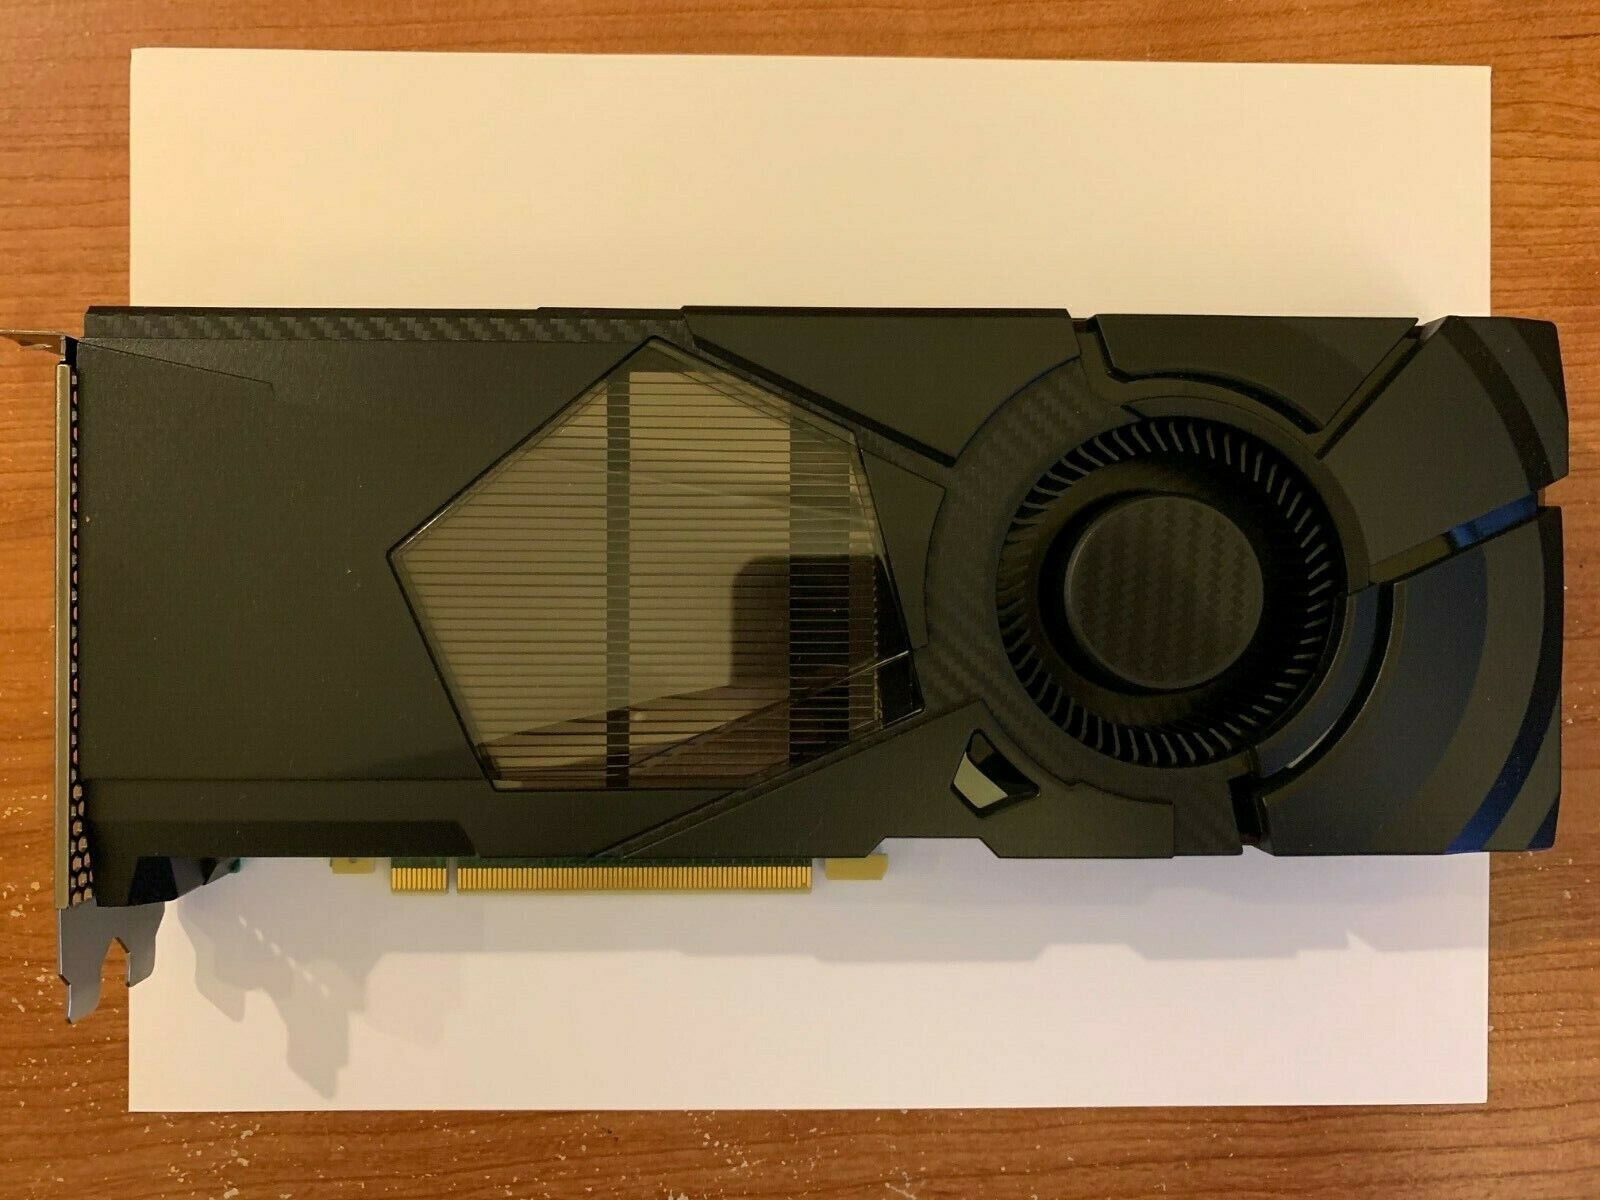 NVIDIA GeForce RTX 2070 Super Blower 8GB ゲーミング グラフィック カード GDDR 6 デル